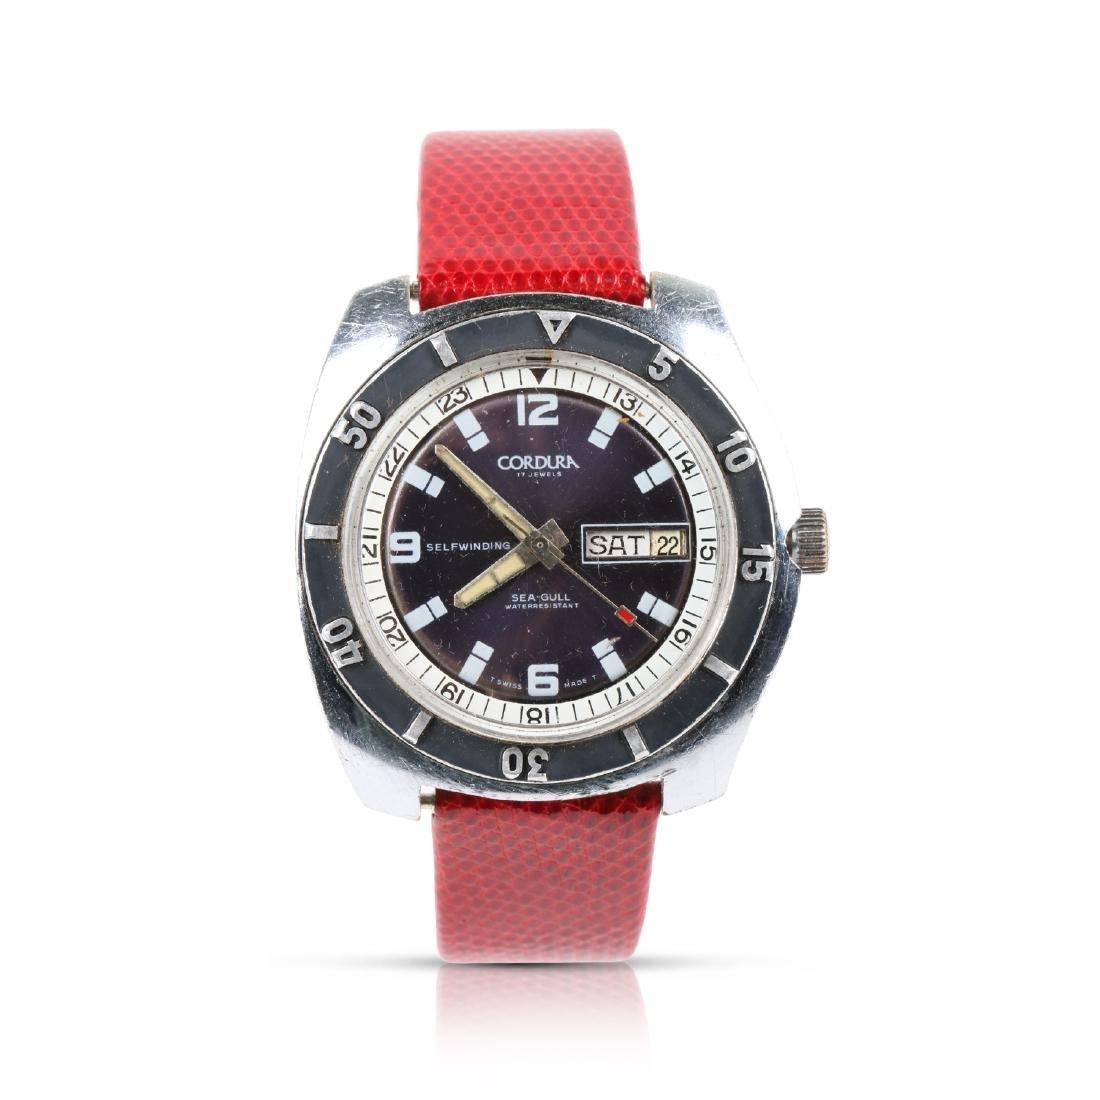 Cordura, Sea-Gull, Ref. Wristwatch